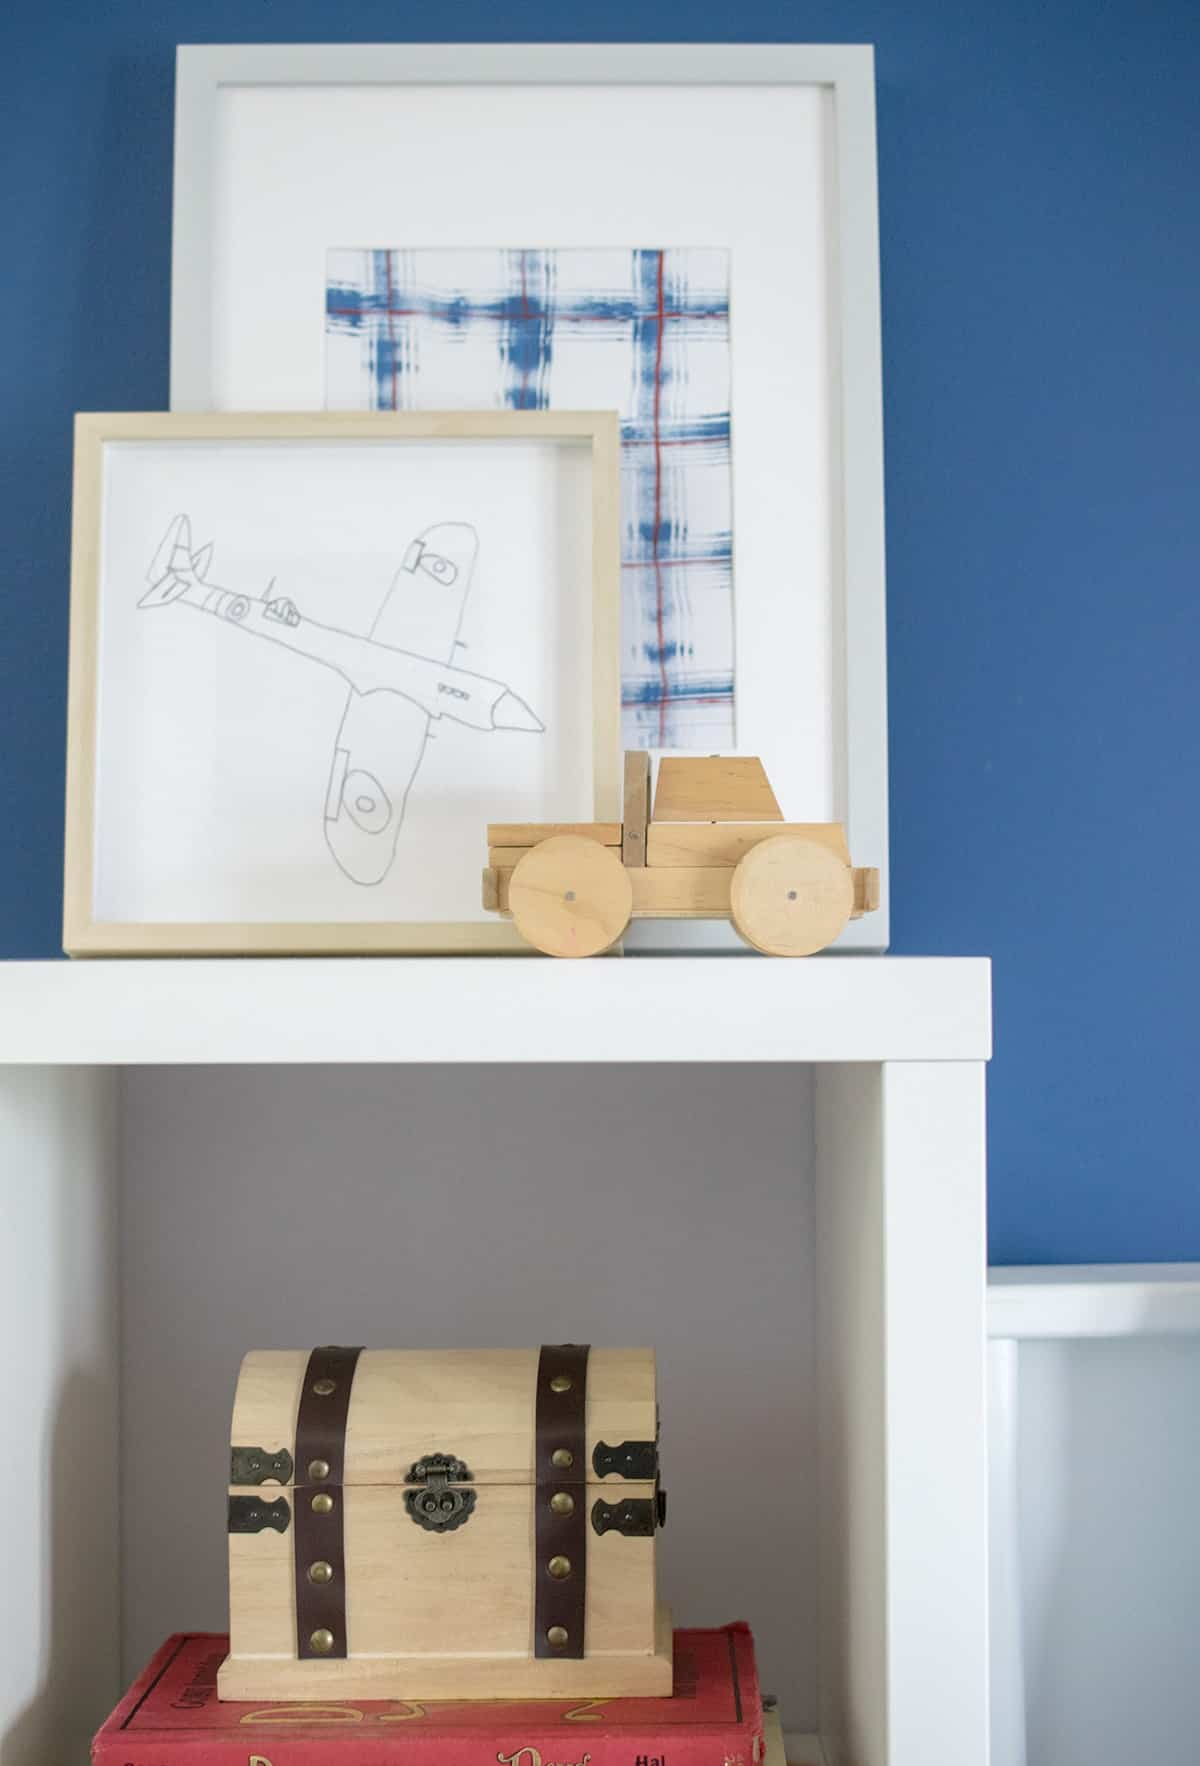 Child's original artwork display on white shelf bedside shelf